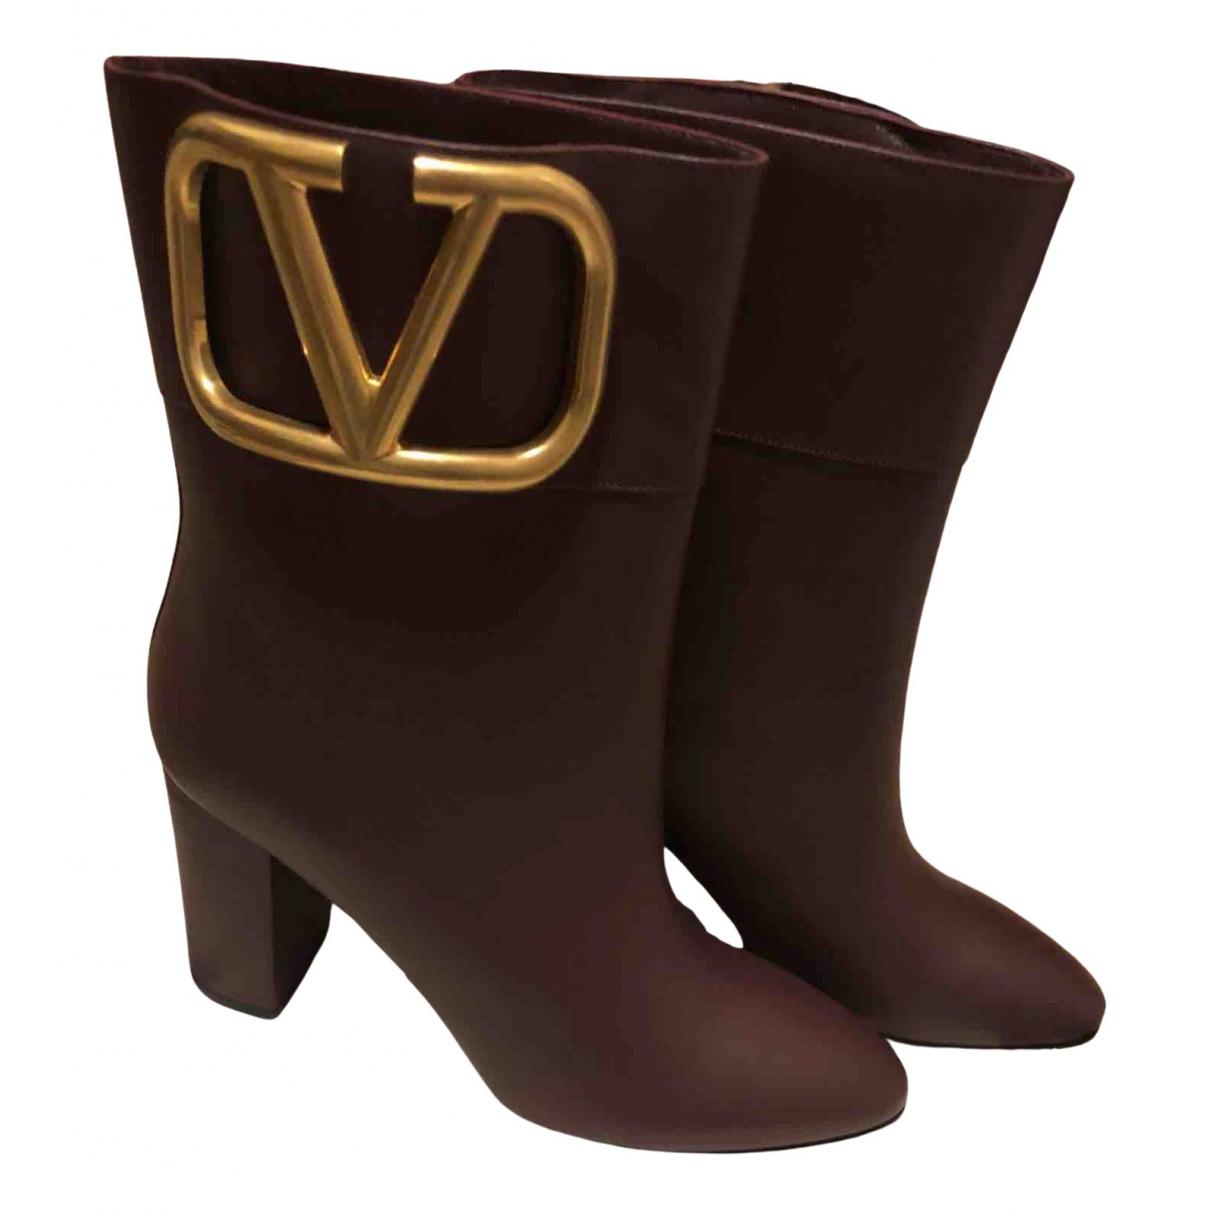 Valentino Garavani N Burgundy Leather Ankle boots for Women 40 EU